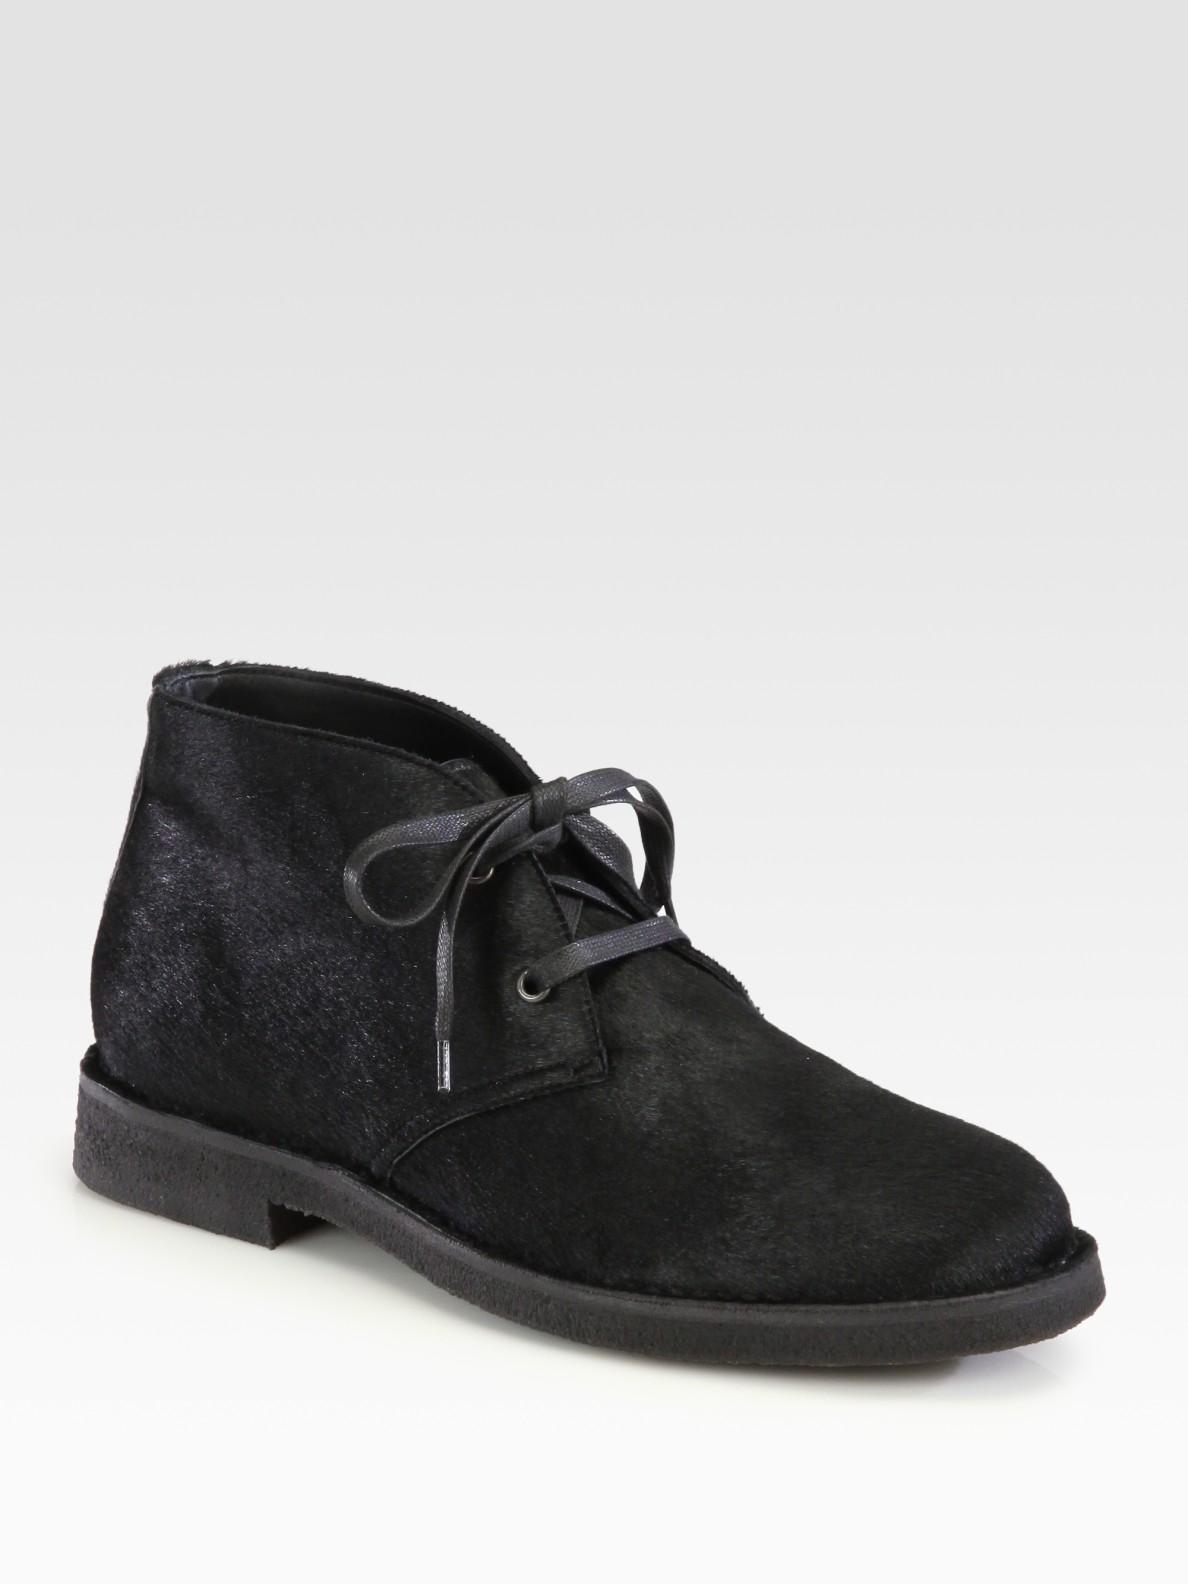 Bottega Veneta Ponyhair Chukka Boots fashion shoes clearance  hot sale online